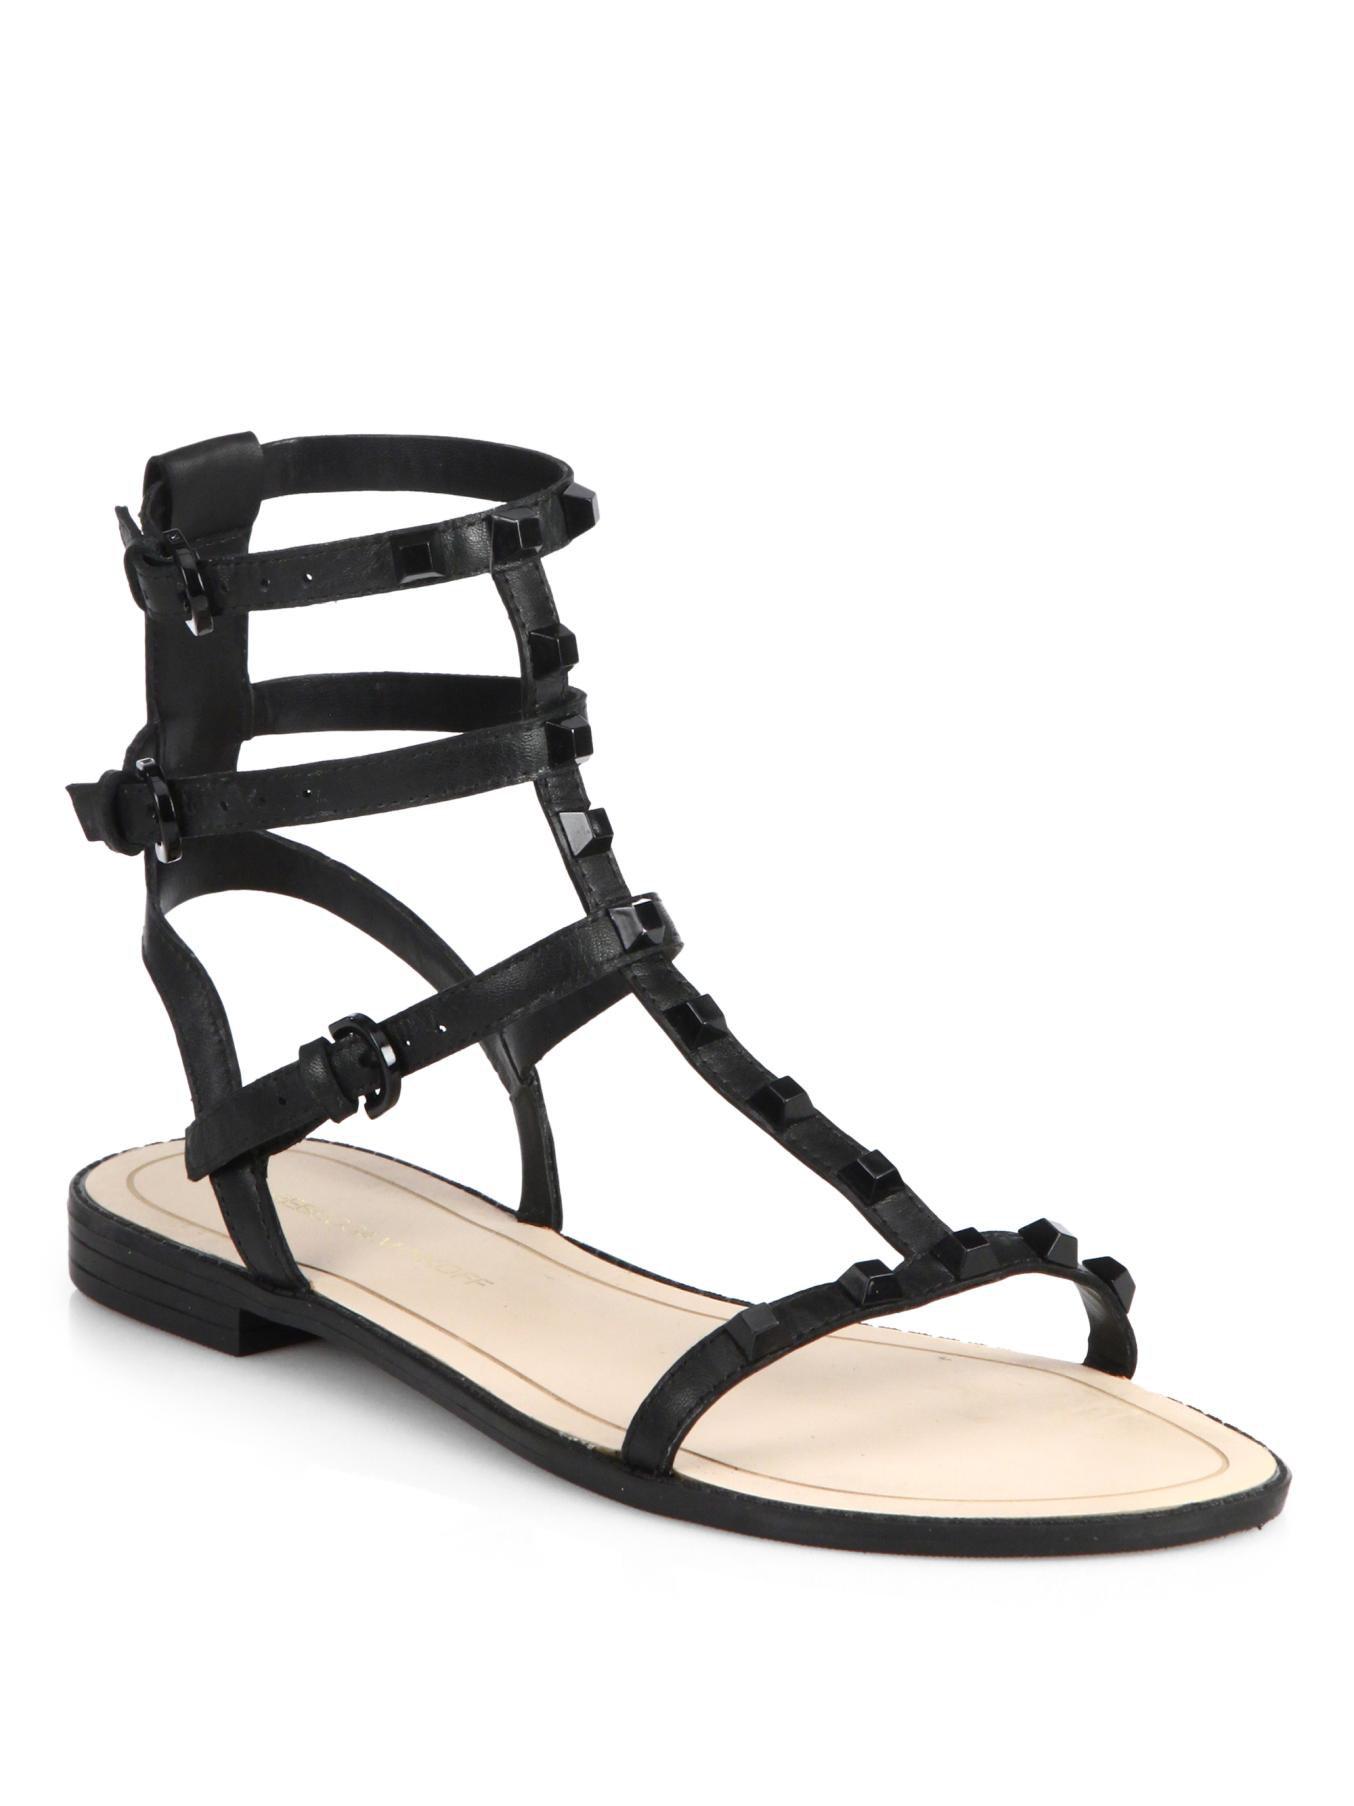 0528a0a04ed Lyst - Rebecca Minkoff Georgina Studded Flat Gladiator Sandals in Black